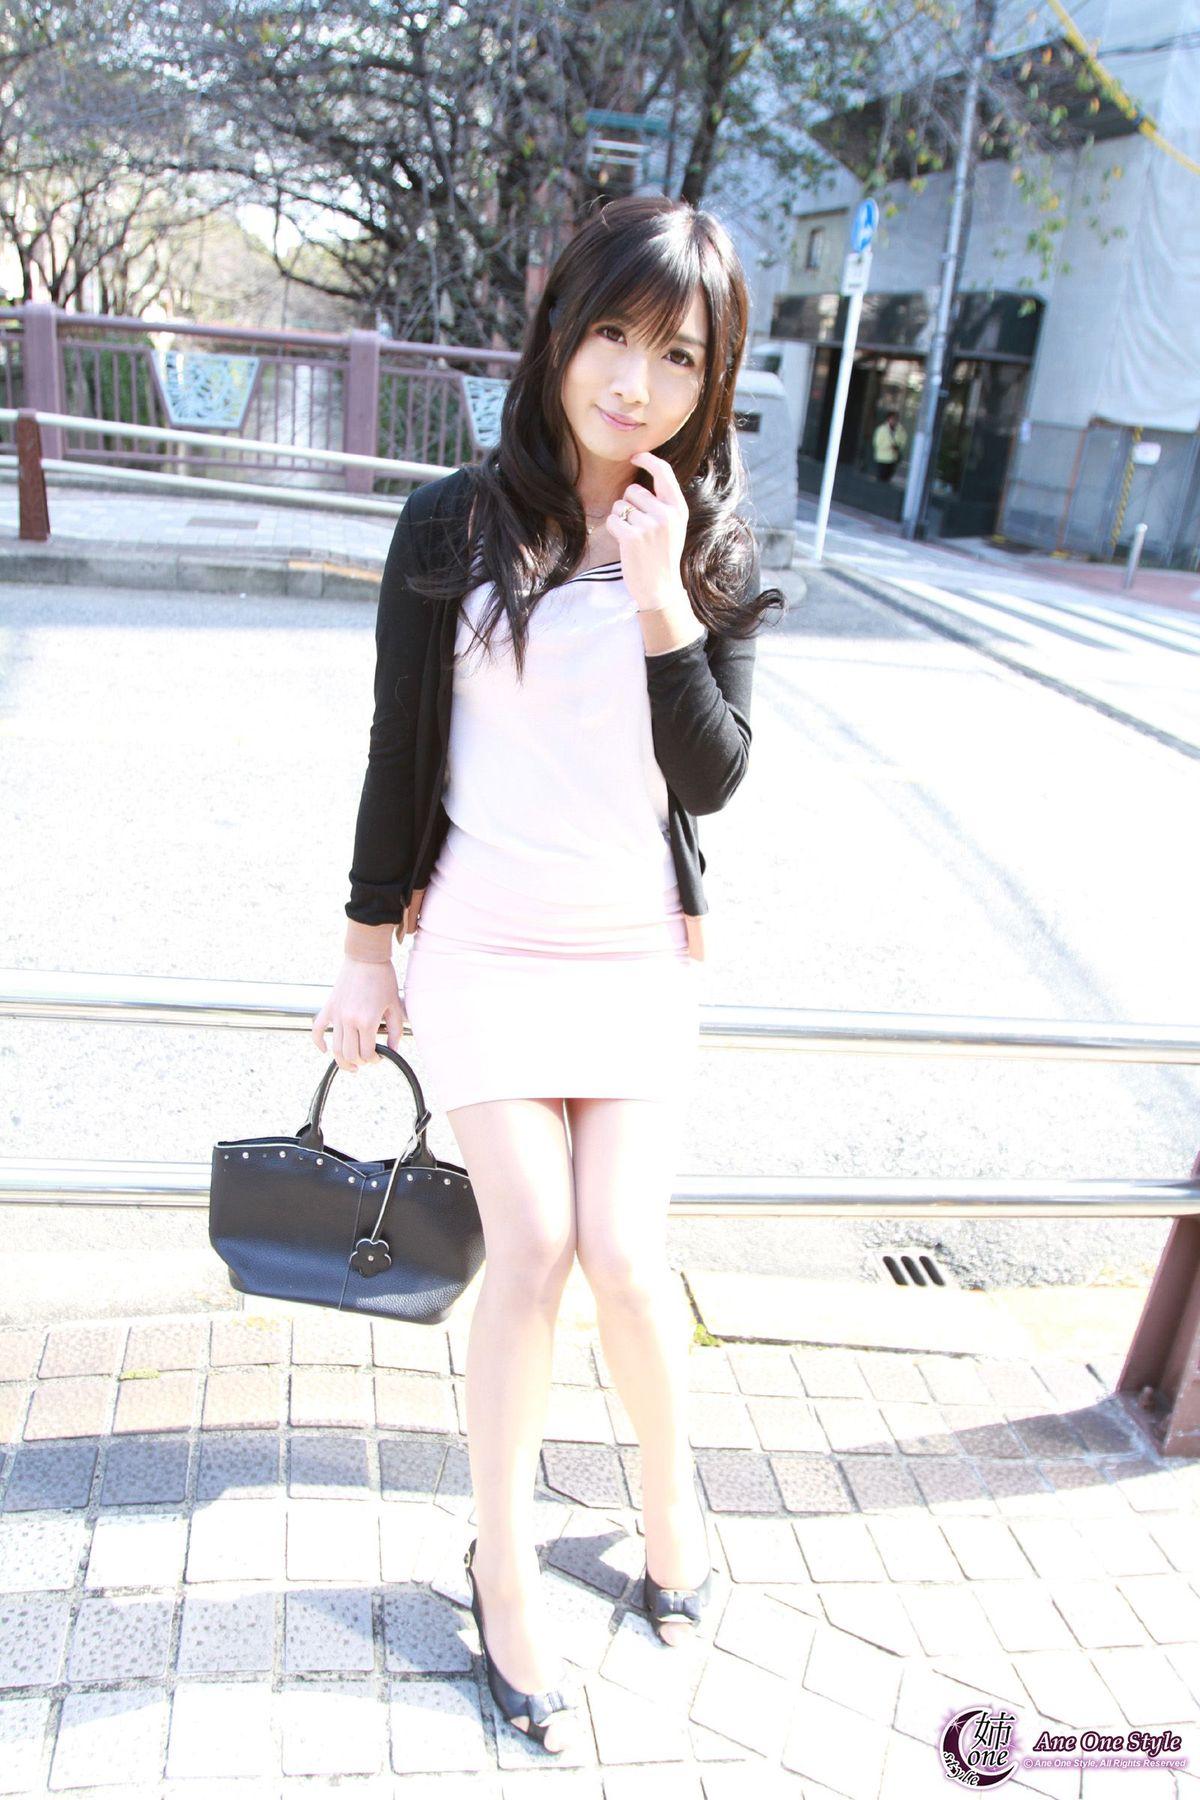 [X-City] Ane One Style No.69 Hibiki Otsuki 大槻ひびき 写真集3